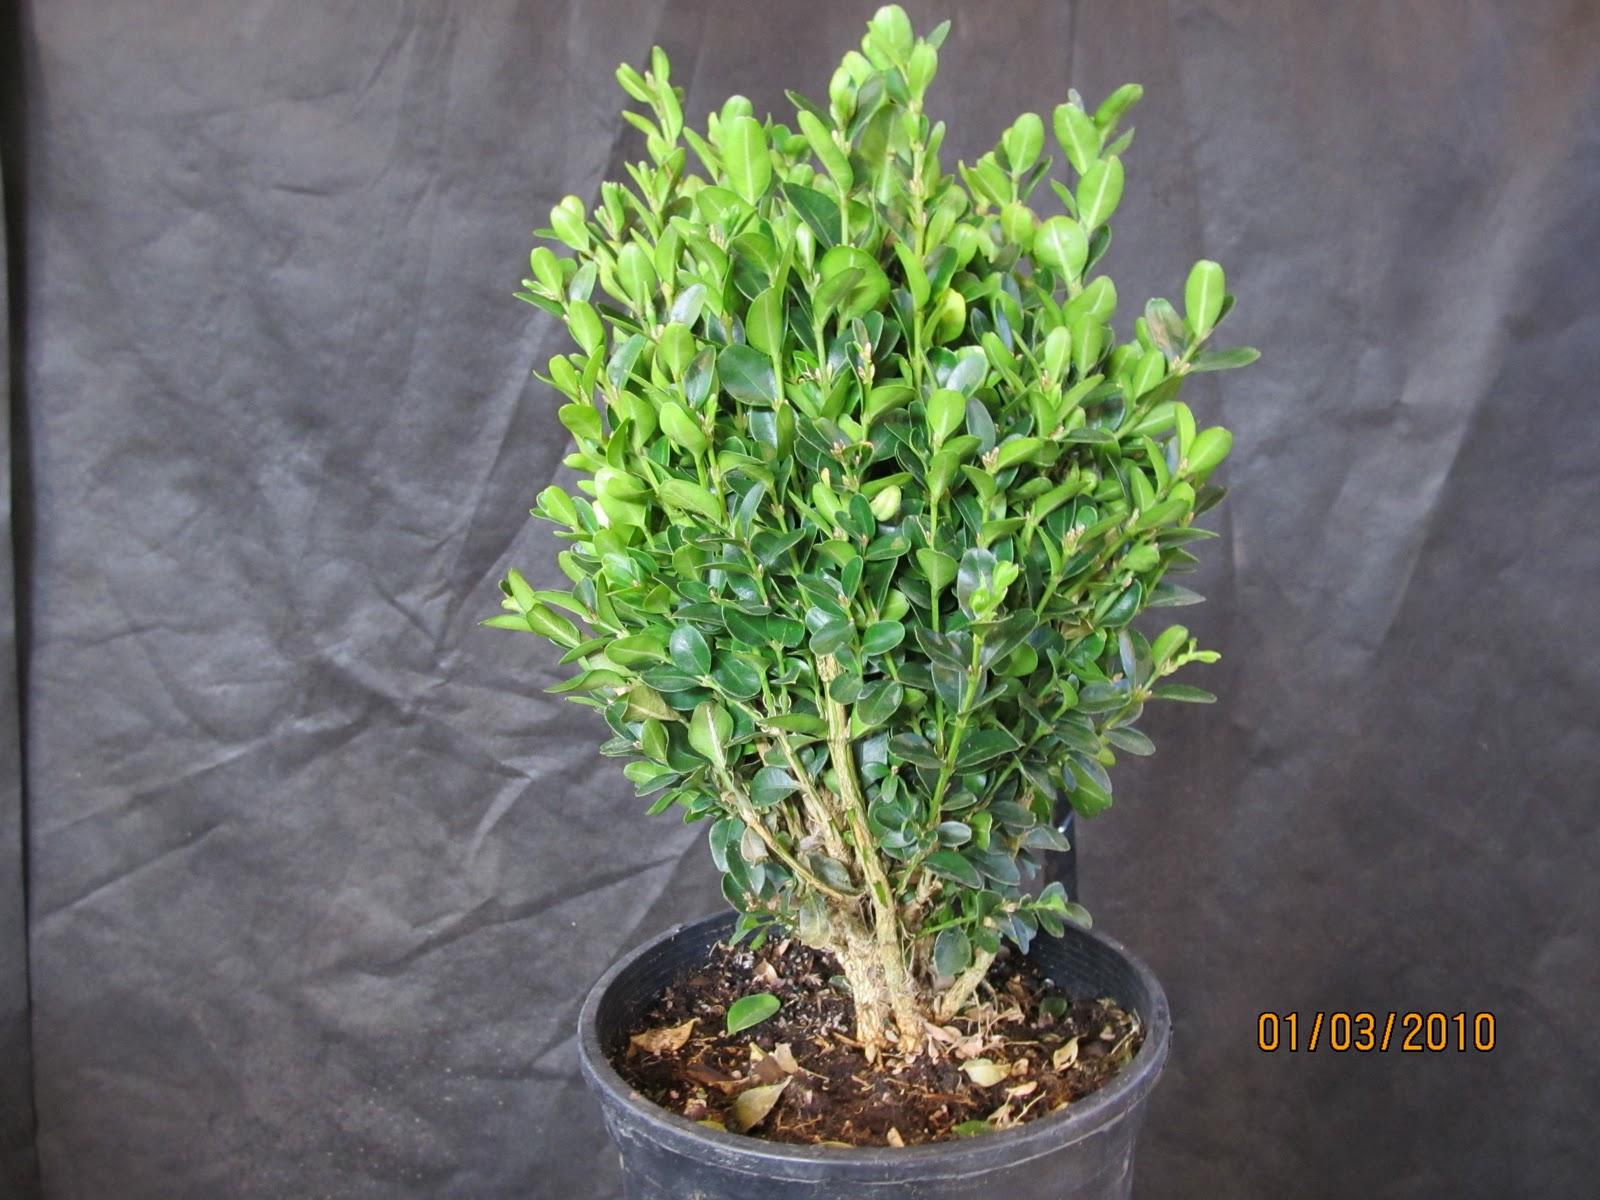 Bonsaibp39s Bonsai Blog Starting Your Bonsai With Nursery Plants